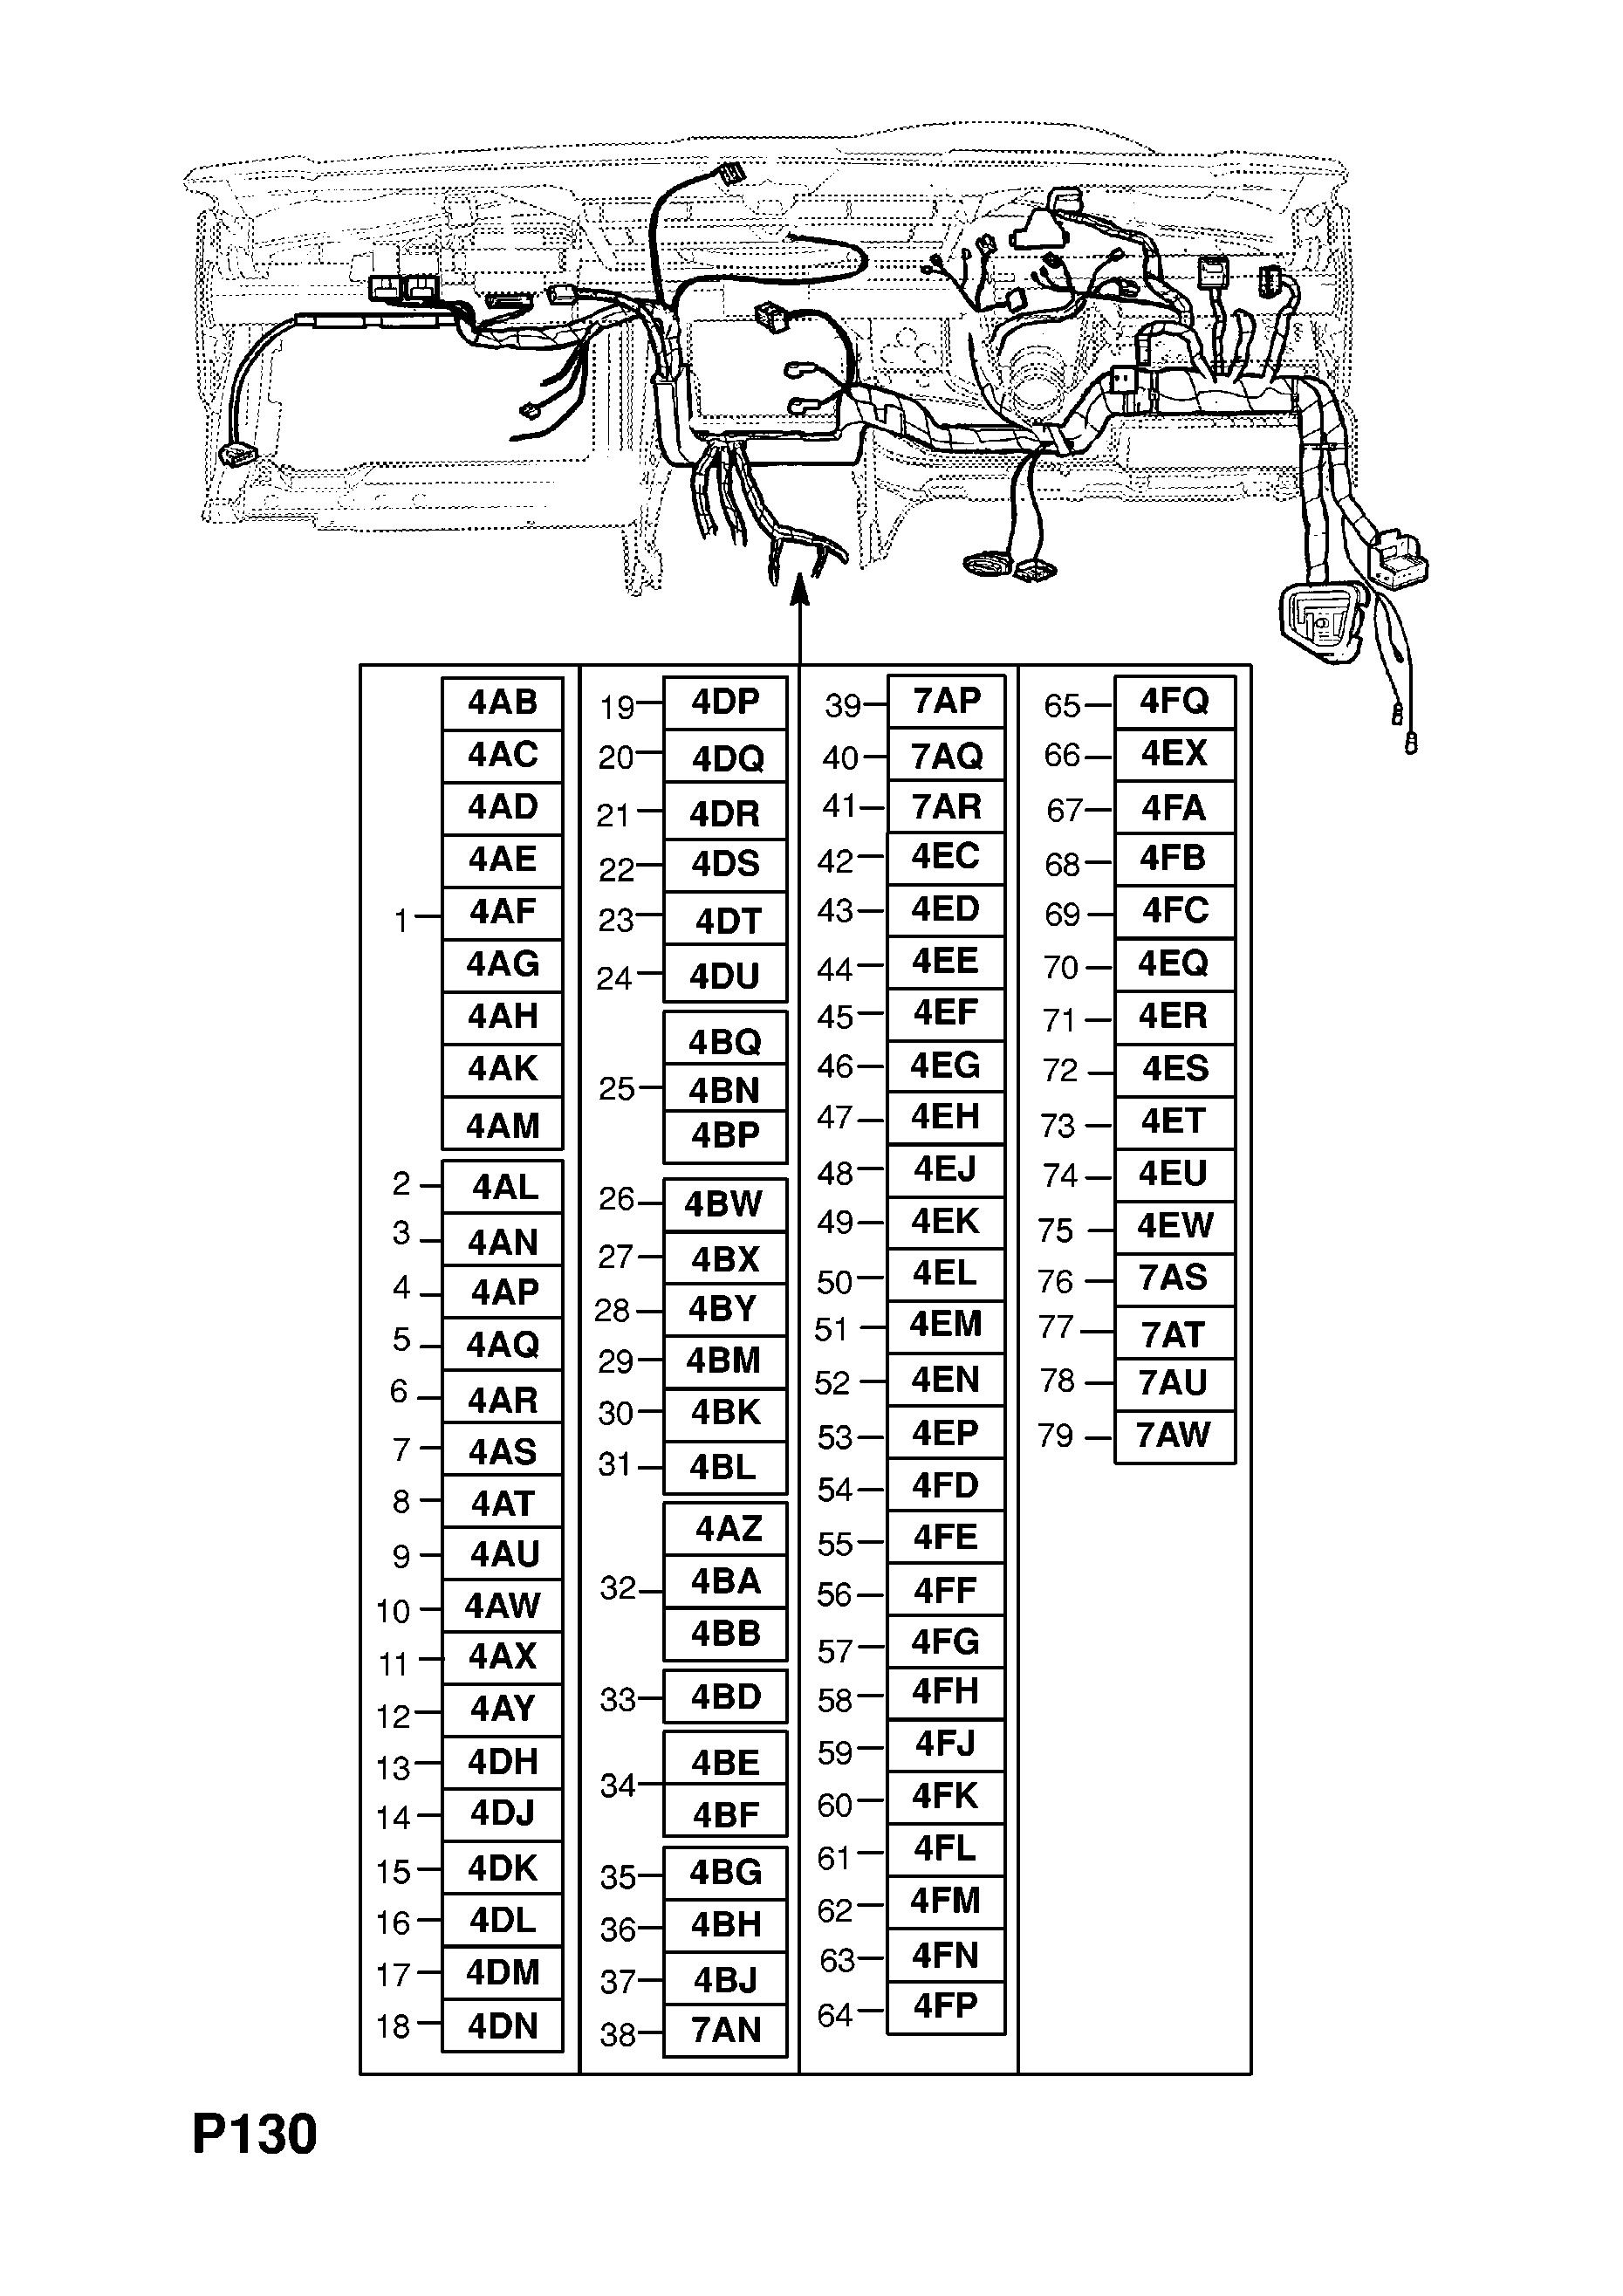 №, gm-part number, genuine part number, description, range  instrument  panel wiring harness